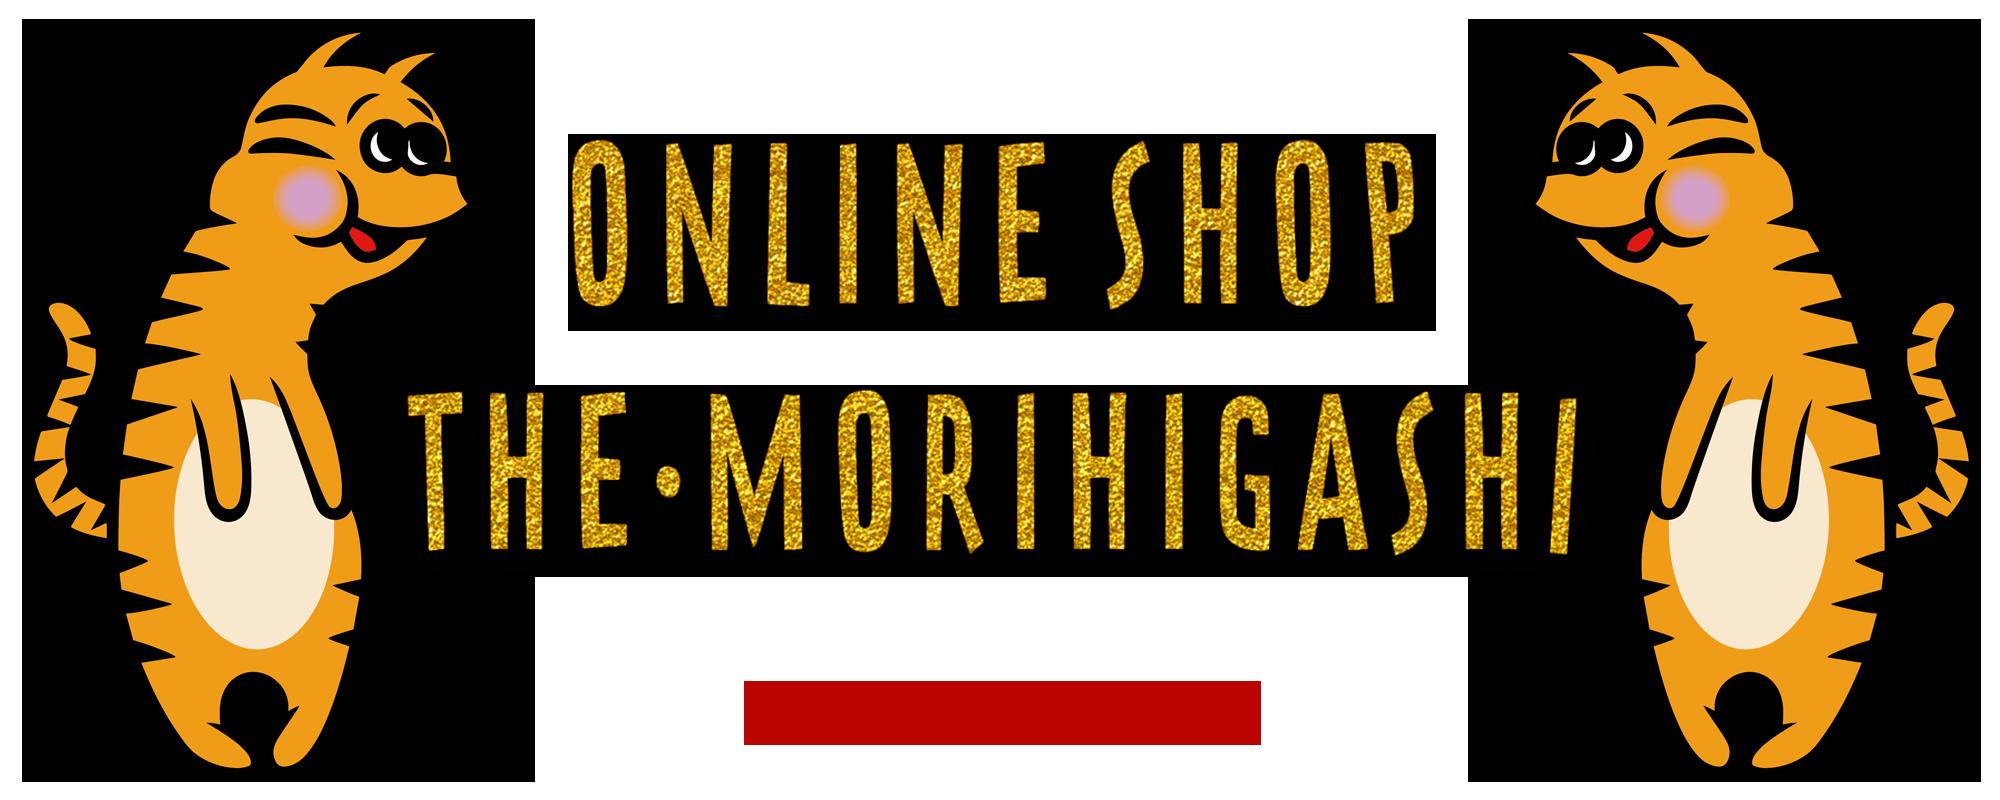 MORIHIGASHI inc.